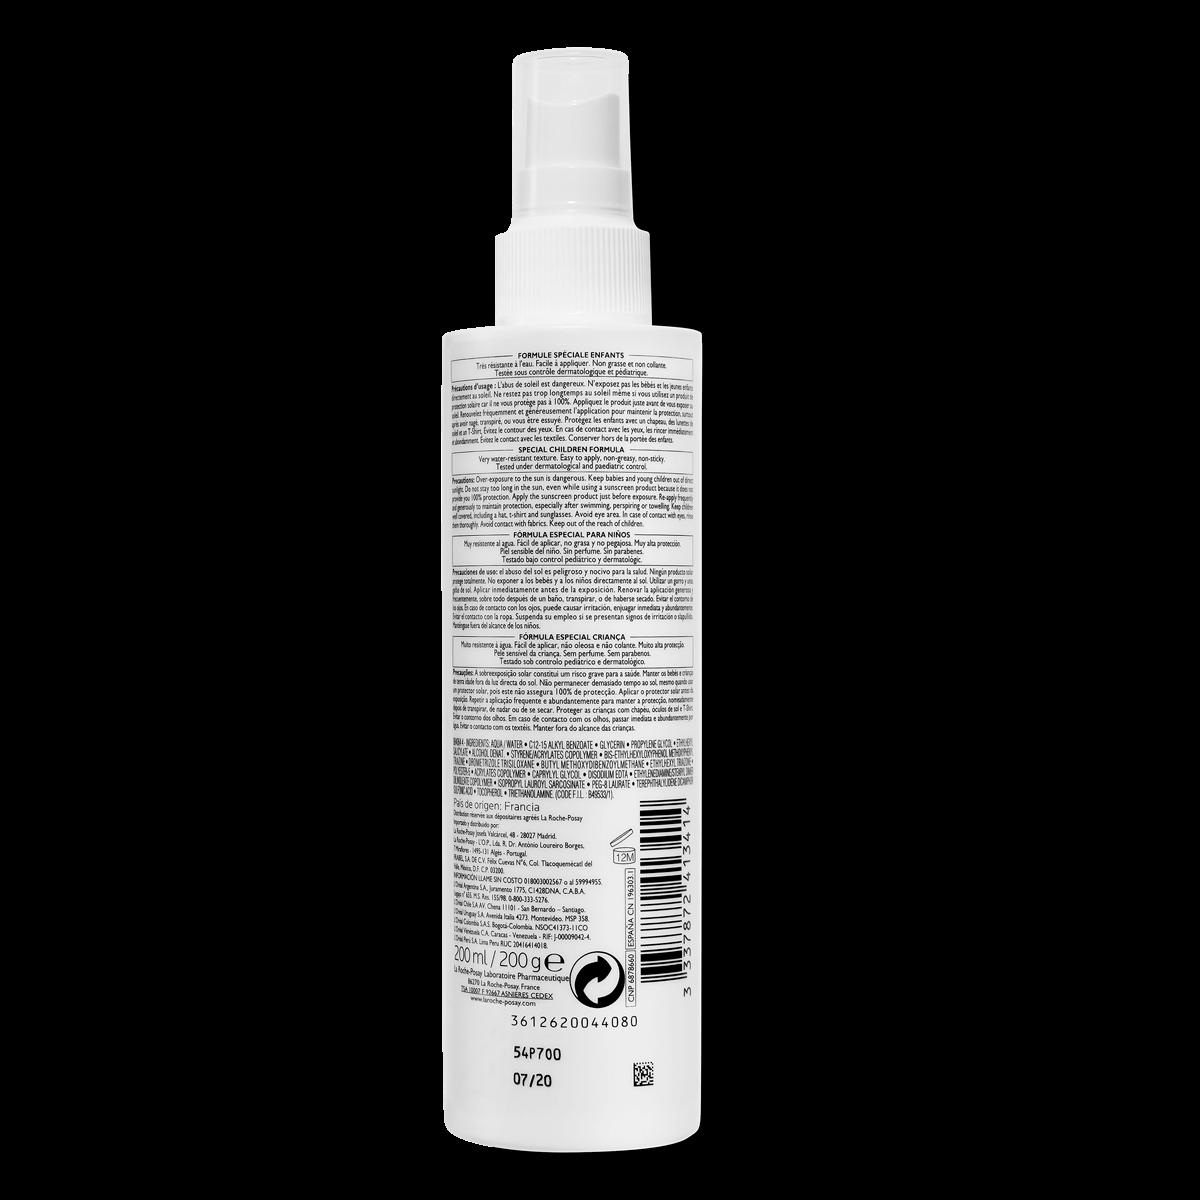 La Roche Posay Tuotesivu Aurinko Anthelios Dermo Pediatrics Spray  Spf50